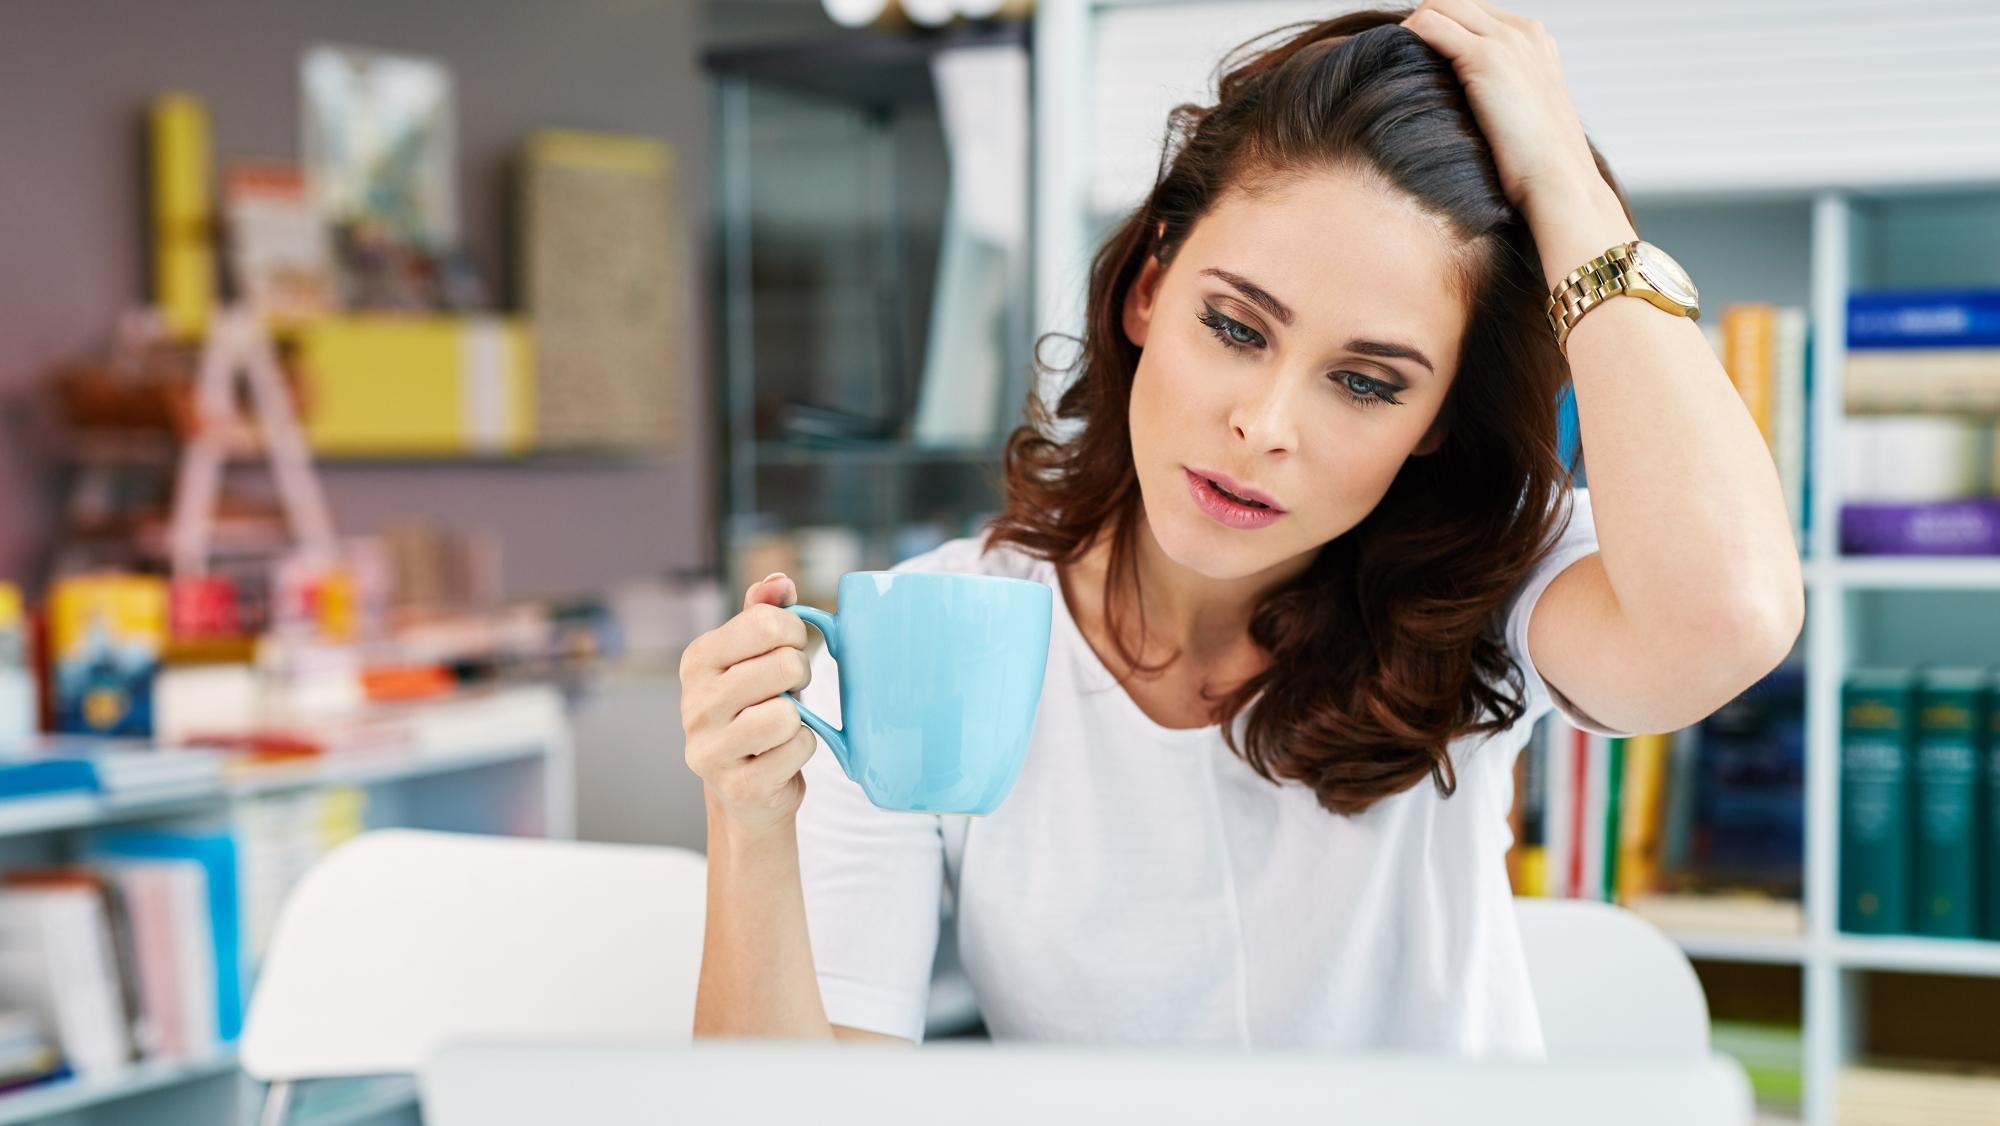 worried-woman-working-on-laptop